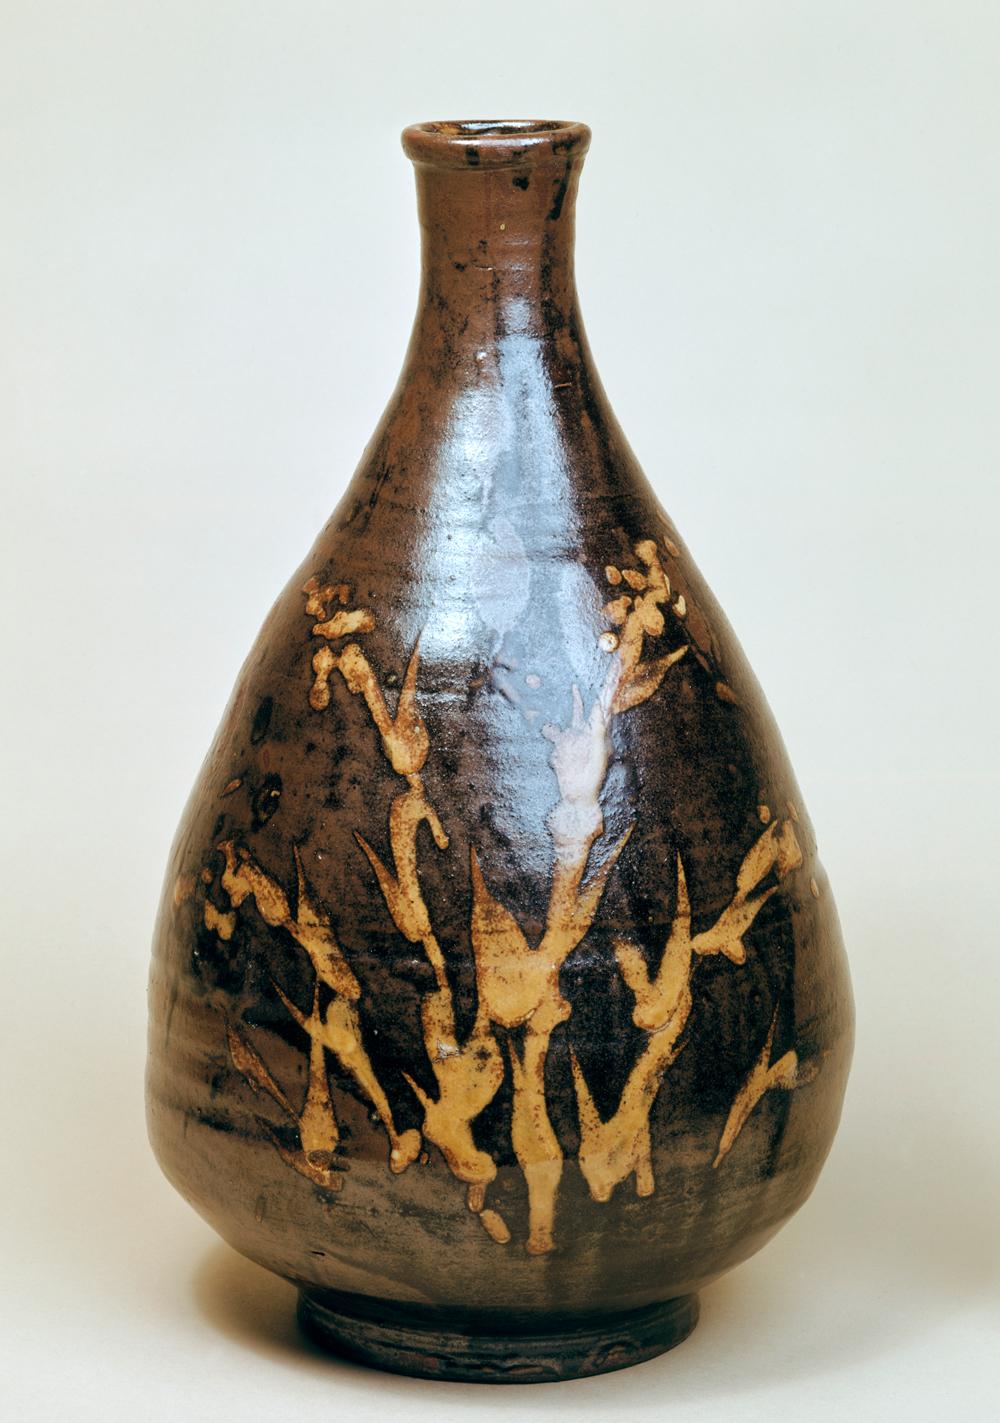 Western arts and crafts - Bottle Shoji Hamada About 1935 Museum No C 33 1943